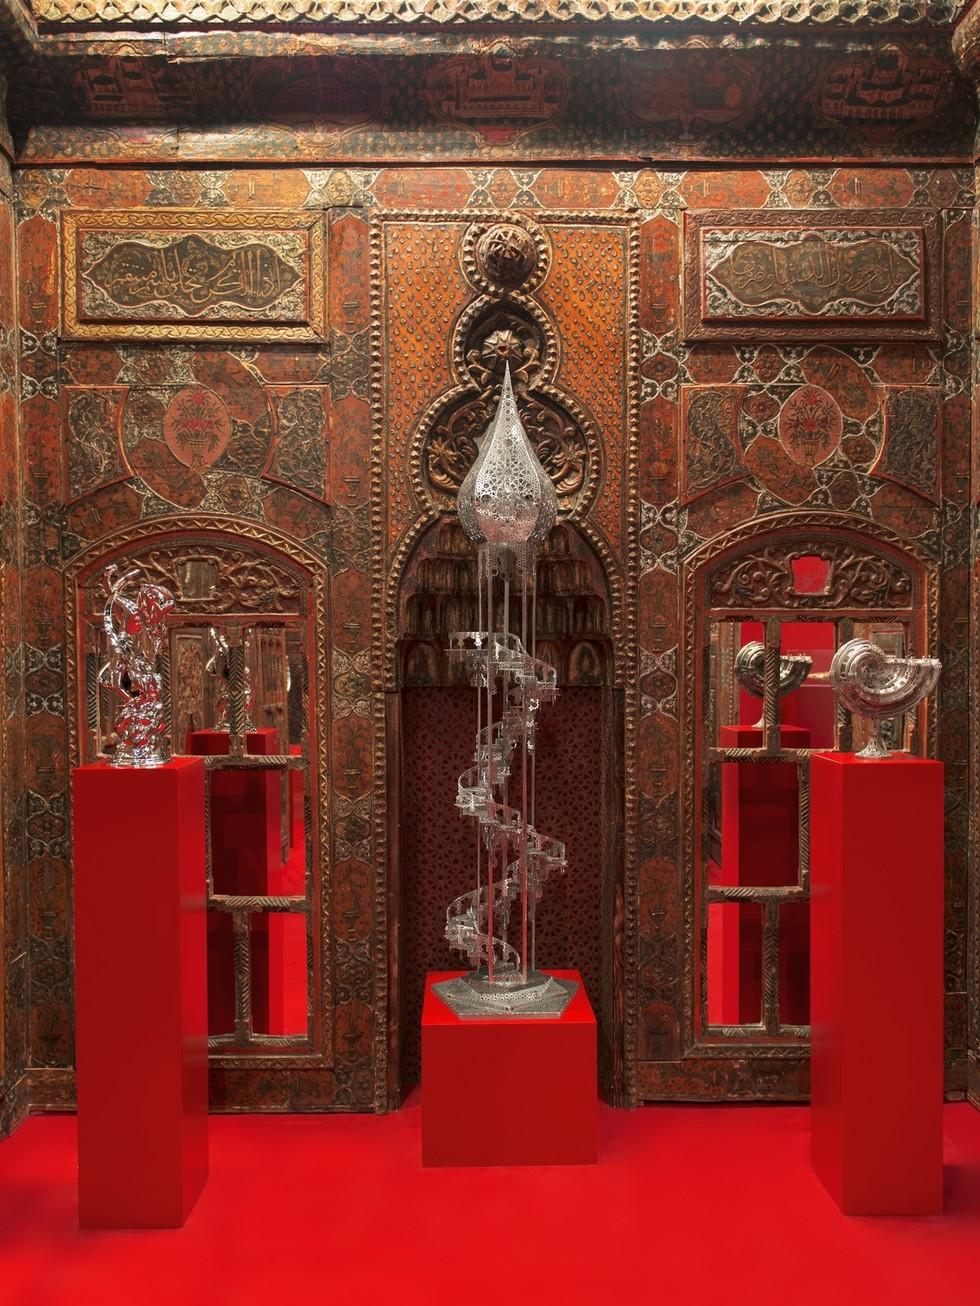 D Art Exhibition In Dubai : Art dubai wimdelvoye be